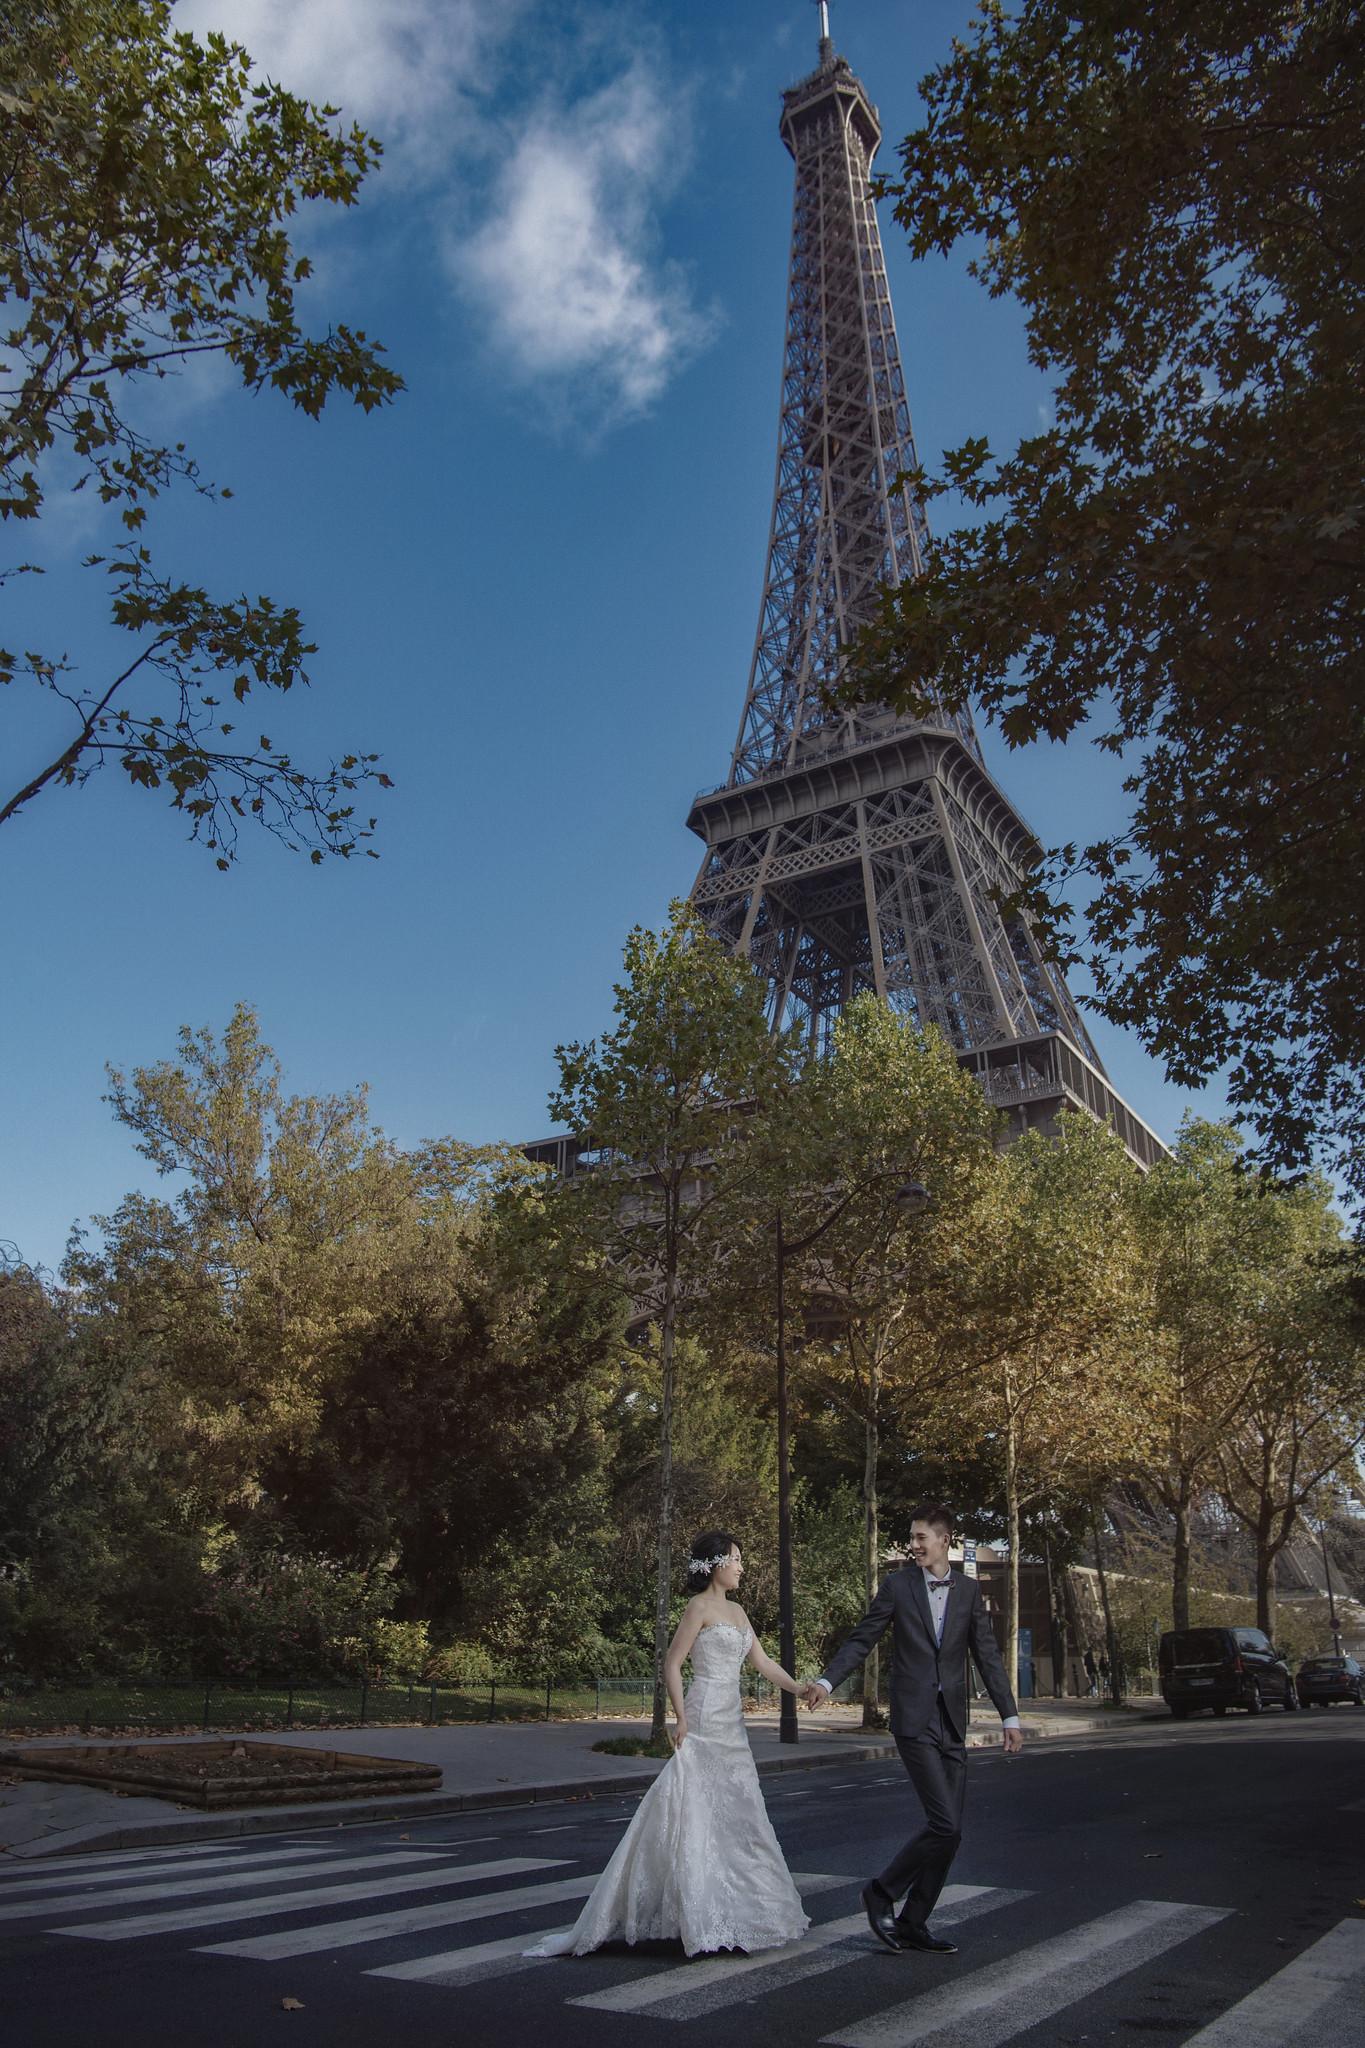 Donfer Photography, EASTERN WEDDING, 東法,Paris 婚紗, 巴黎婚紗 ,海外婚紗, 藝術婚紗